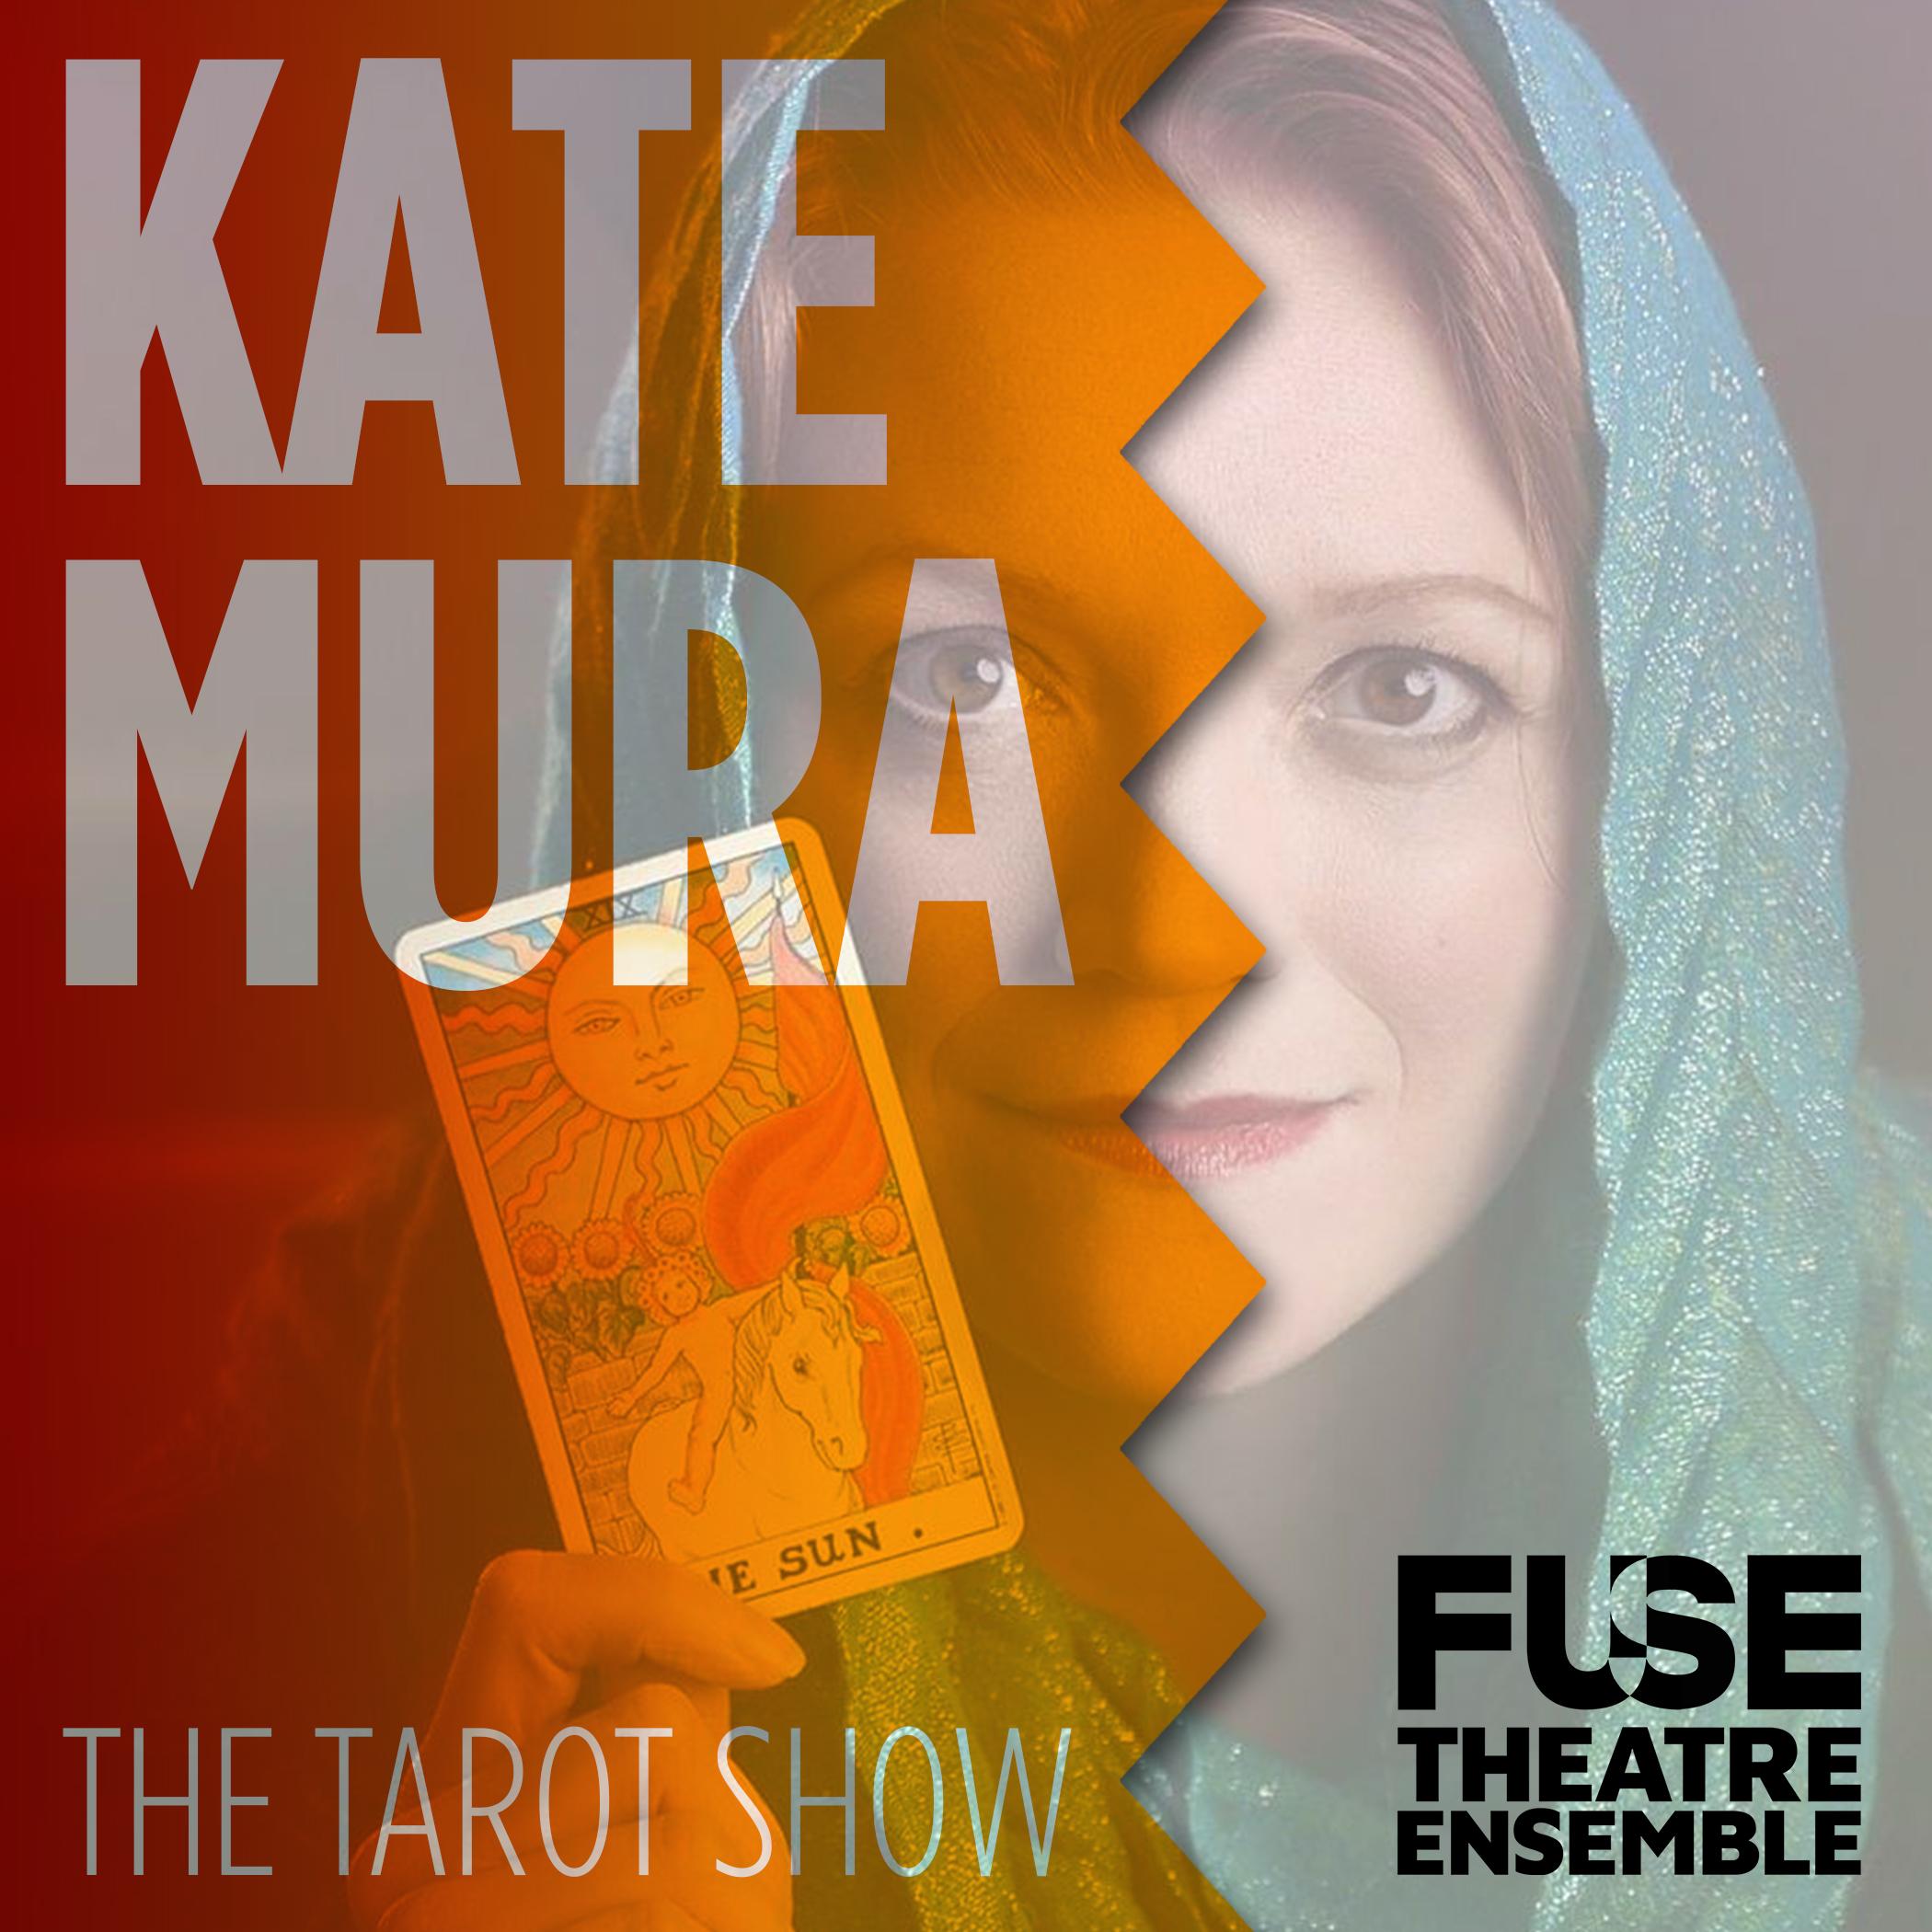 The Tarot Show _FUSE_Kate Mura_Gary Norman.jpg